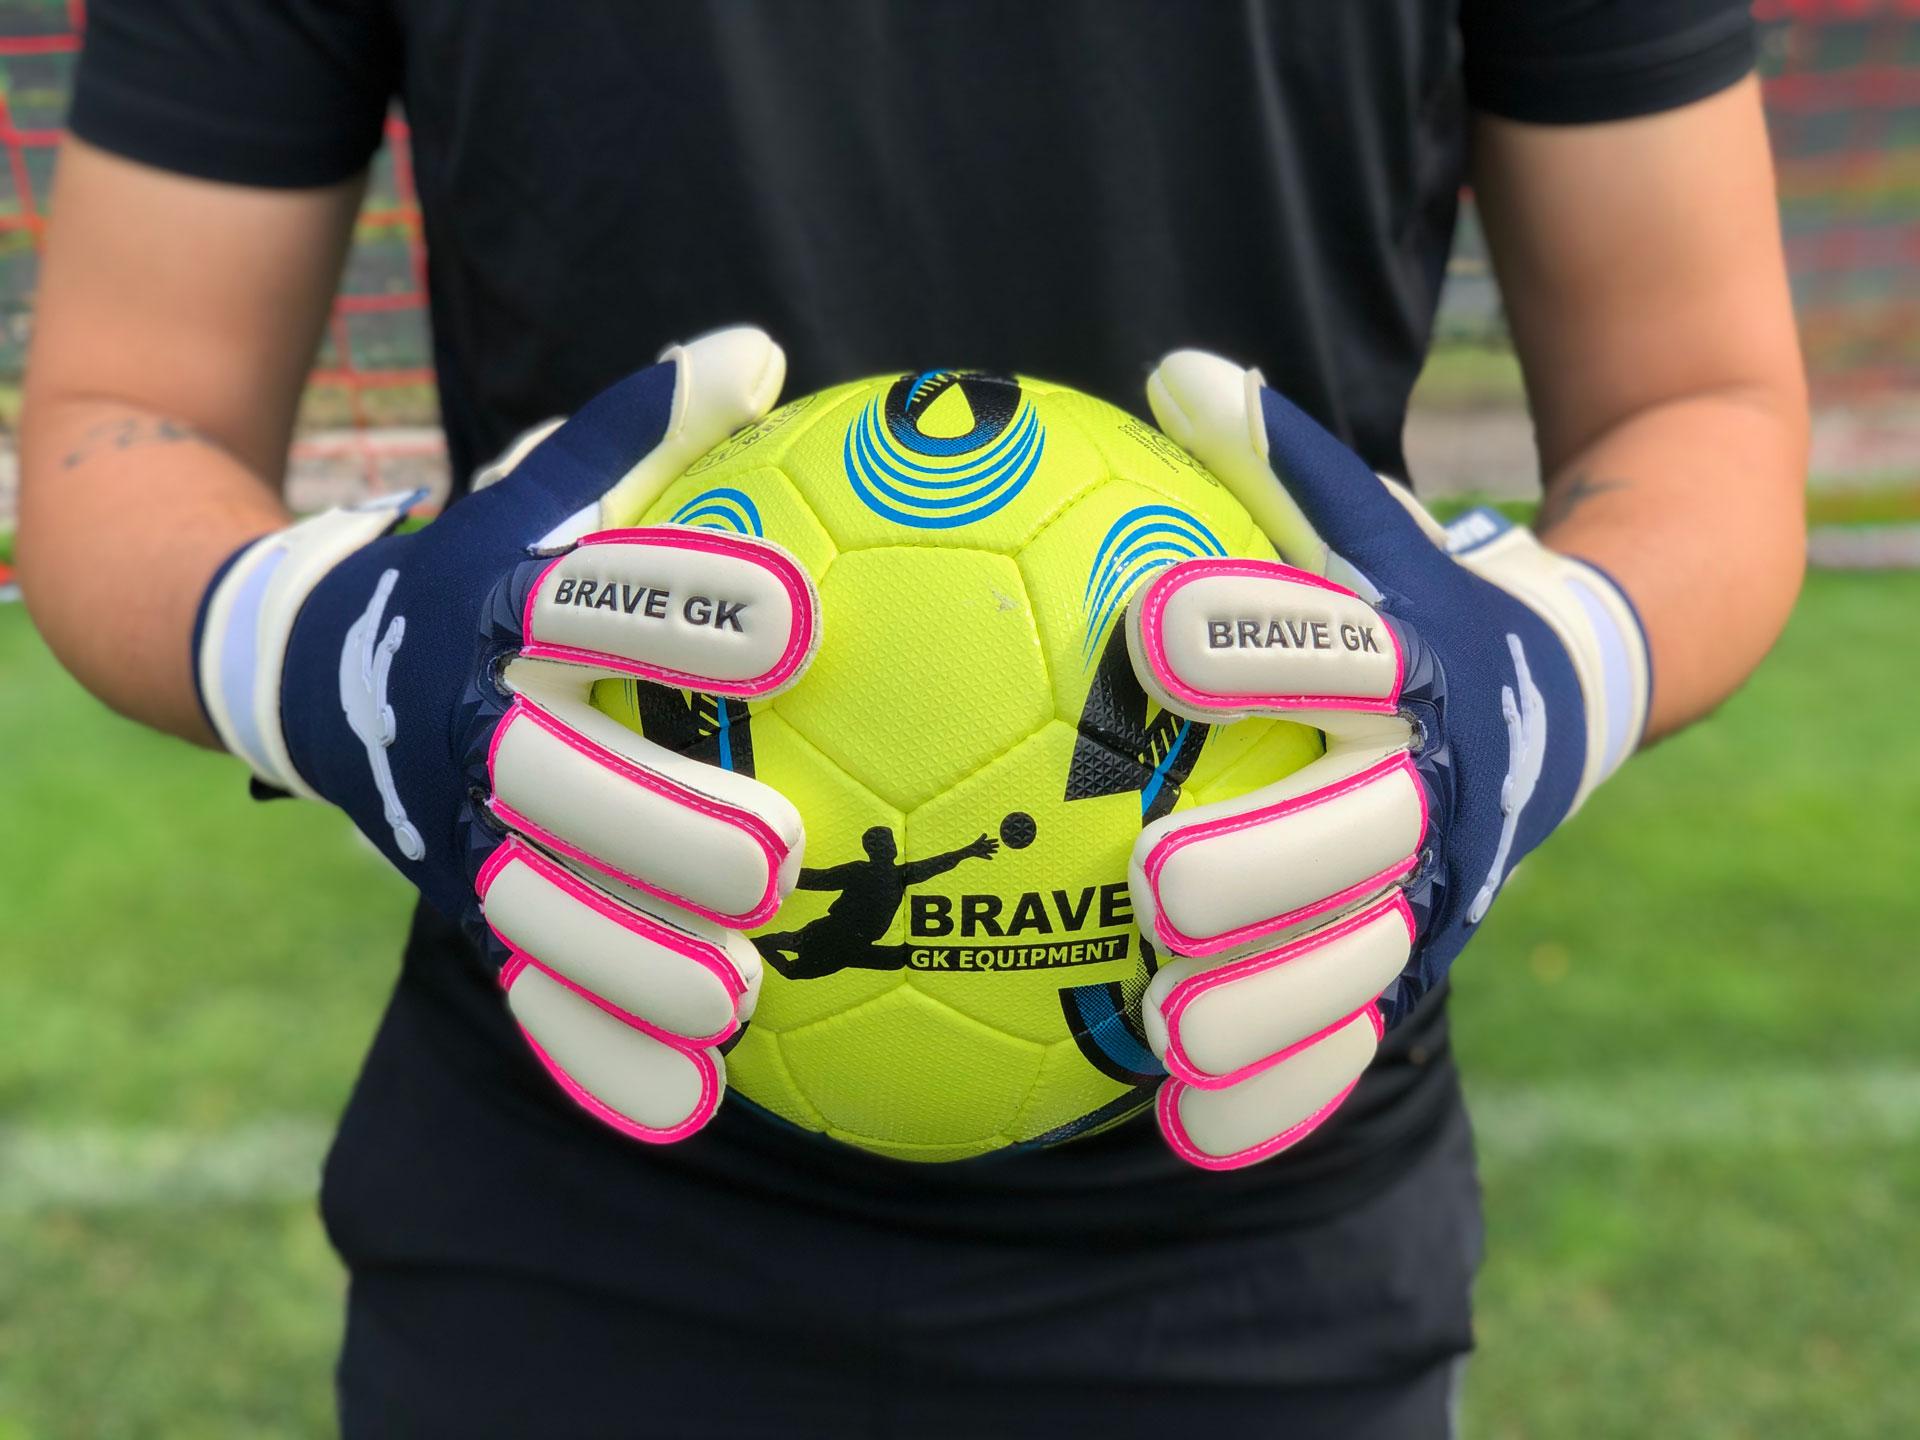 Воротарські рукавиці Brave GK PT UNIQUE-офіційний інтернет магазин Brave GK